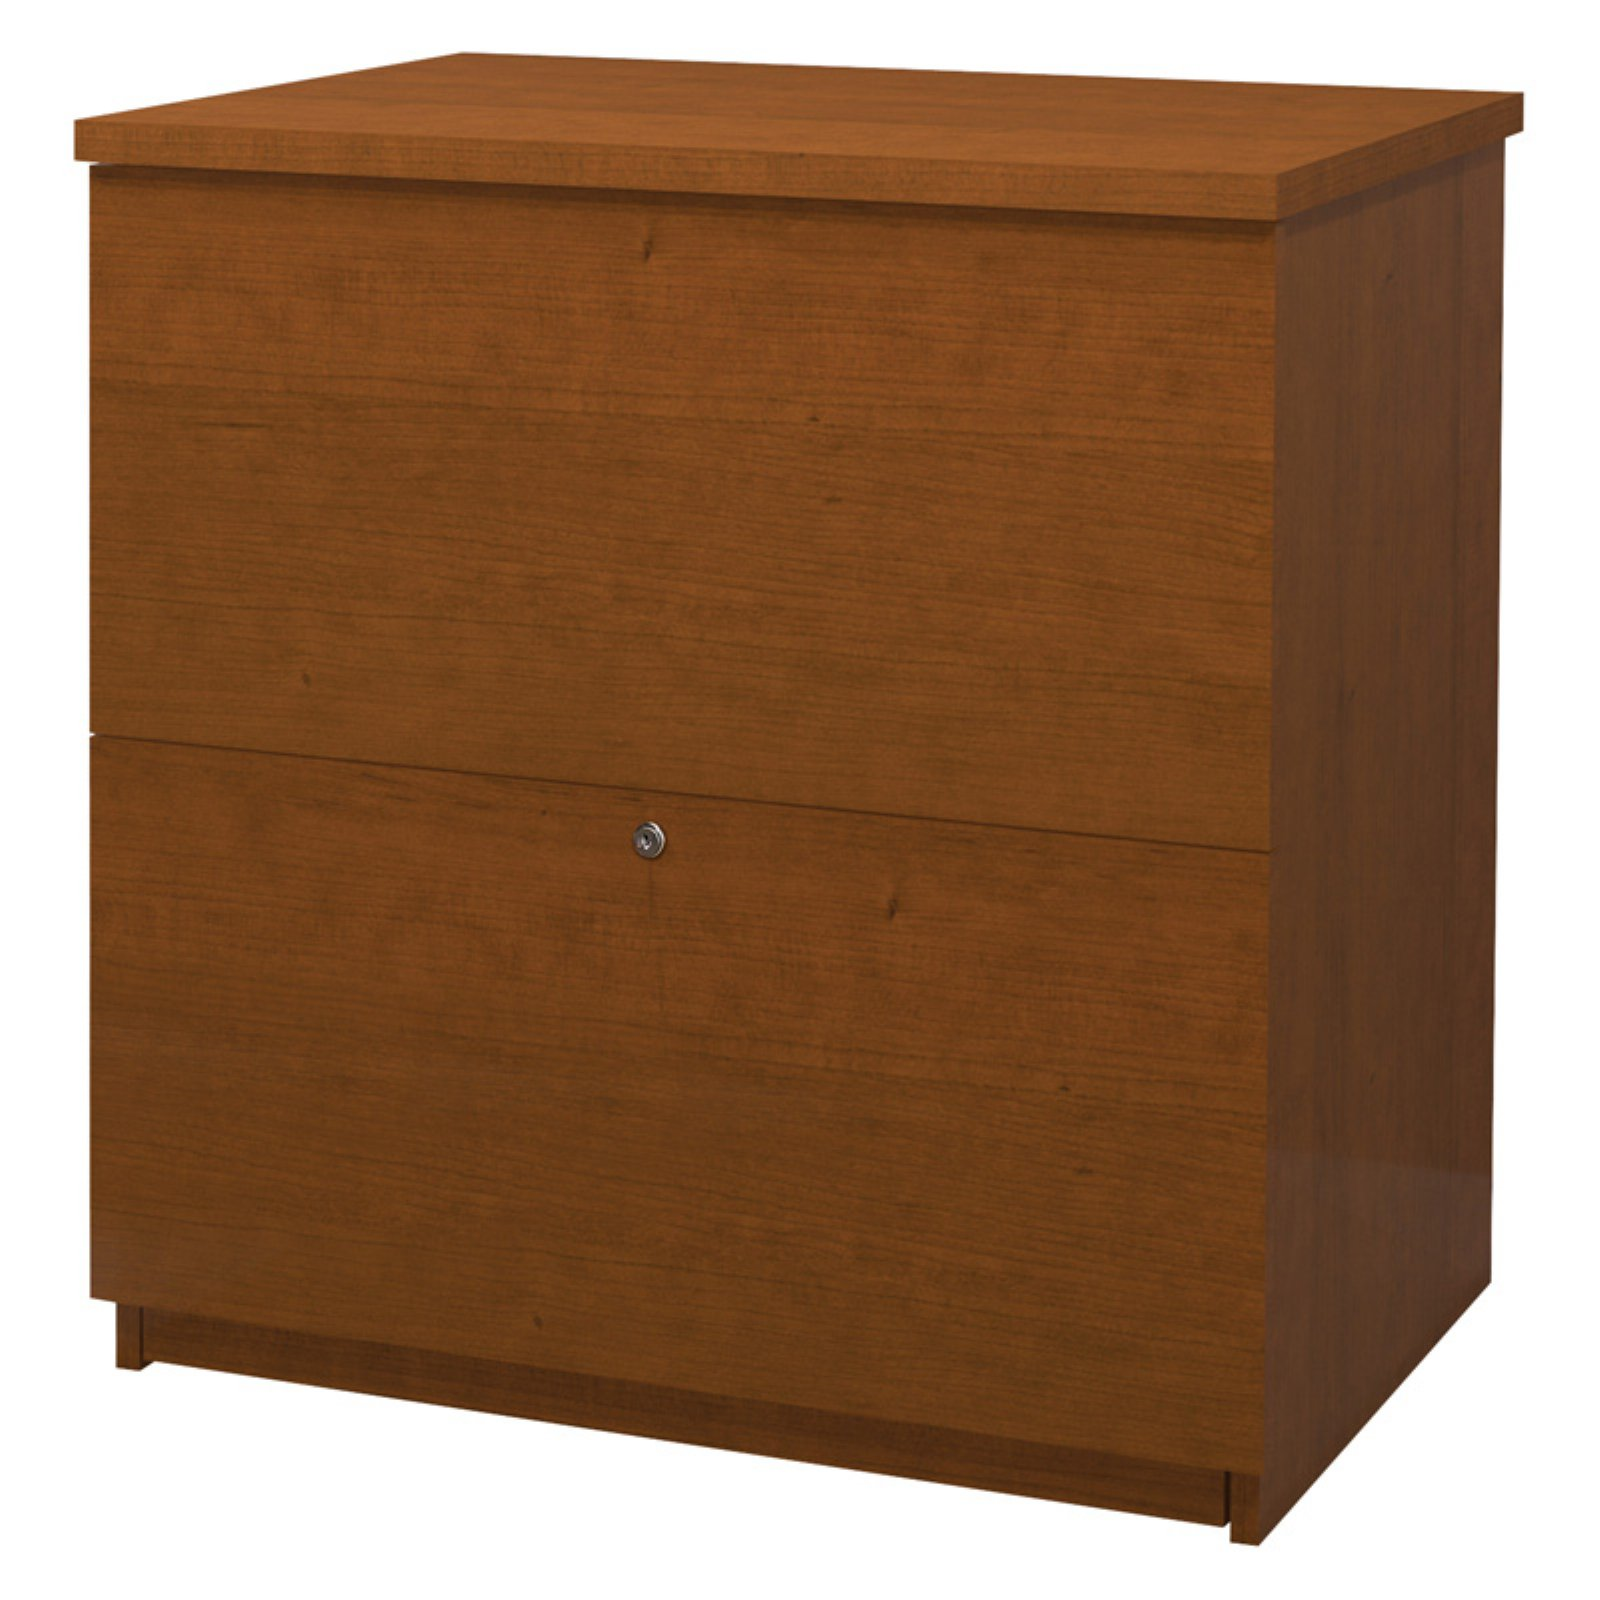 Bestar 2 Drawer Lateral Wood Lockable Filing Cabinet, Walnut by Bestar